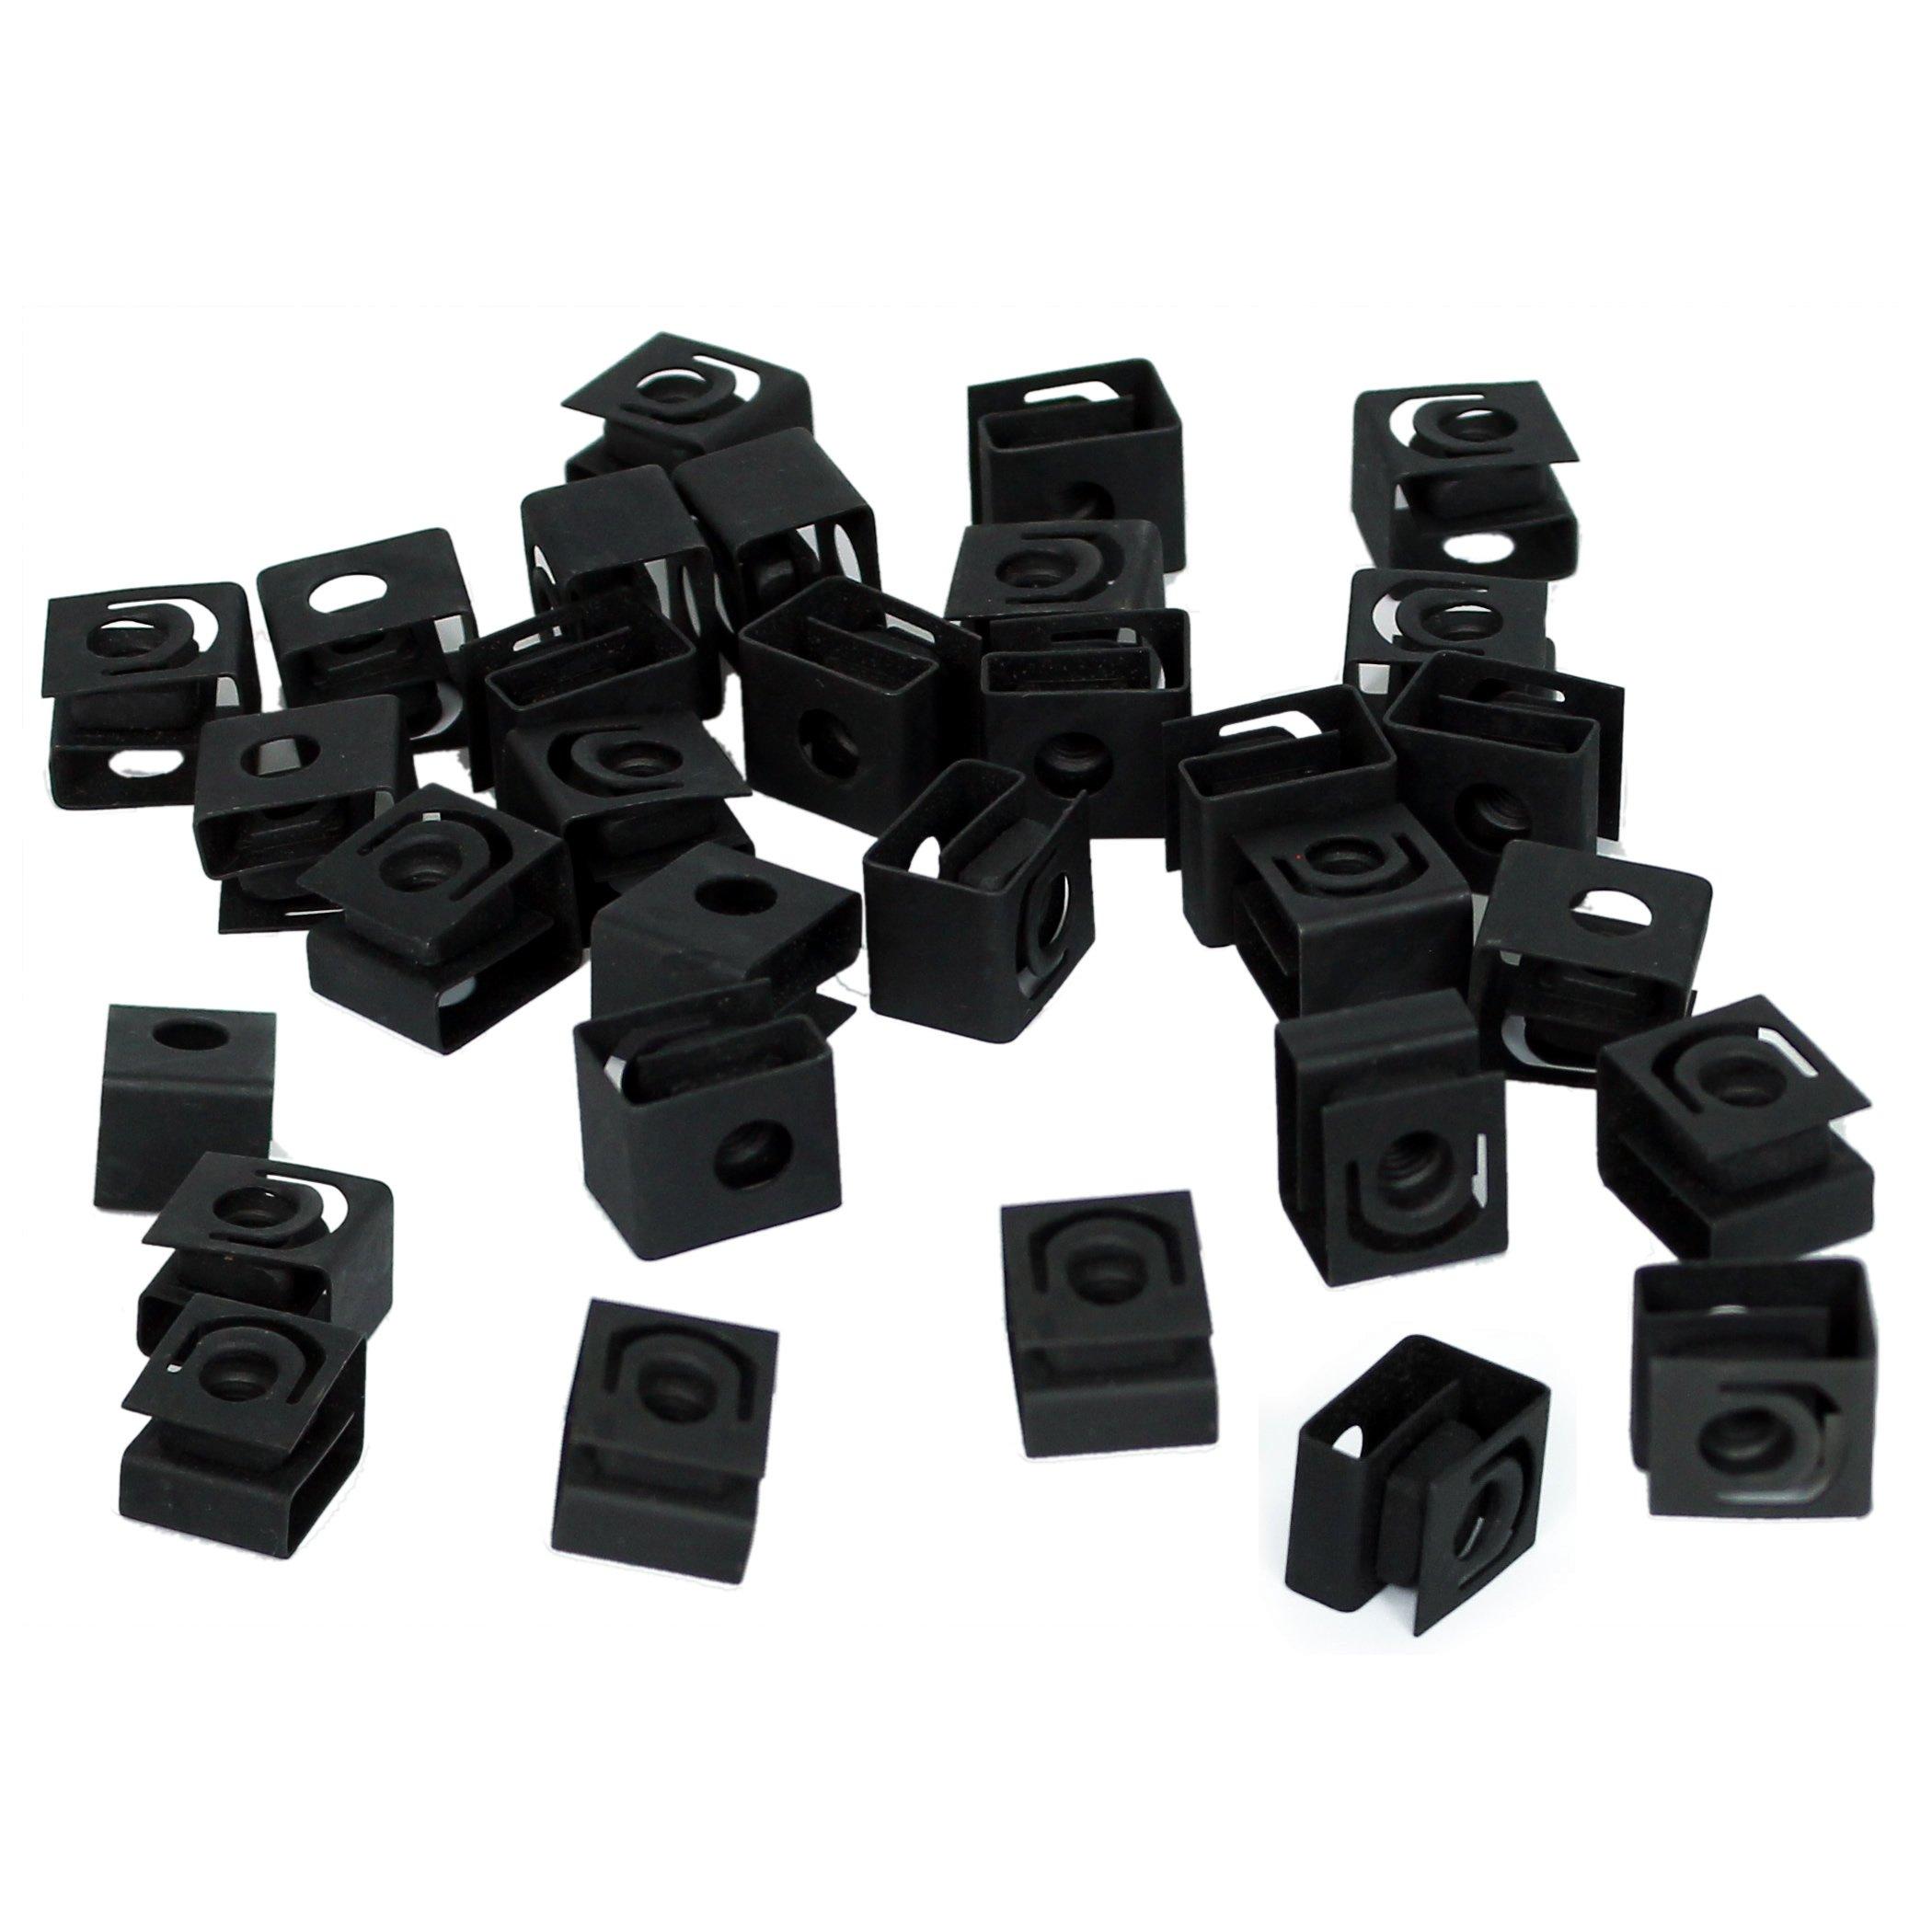 TCH Hardware 100 Pack Black Steel Cage Nuts 10-32 UNF - Network Server AV Rack Mount Shelves Cabinet Rail Caged Captive Clip by TCH (Image #1)